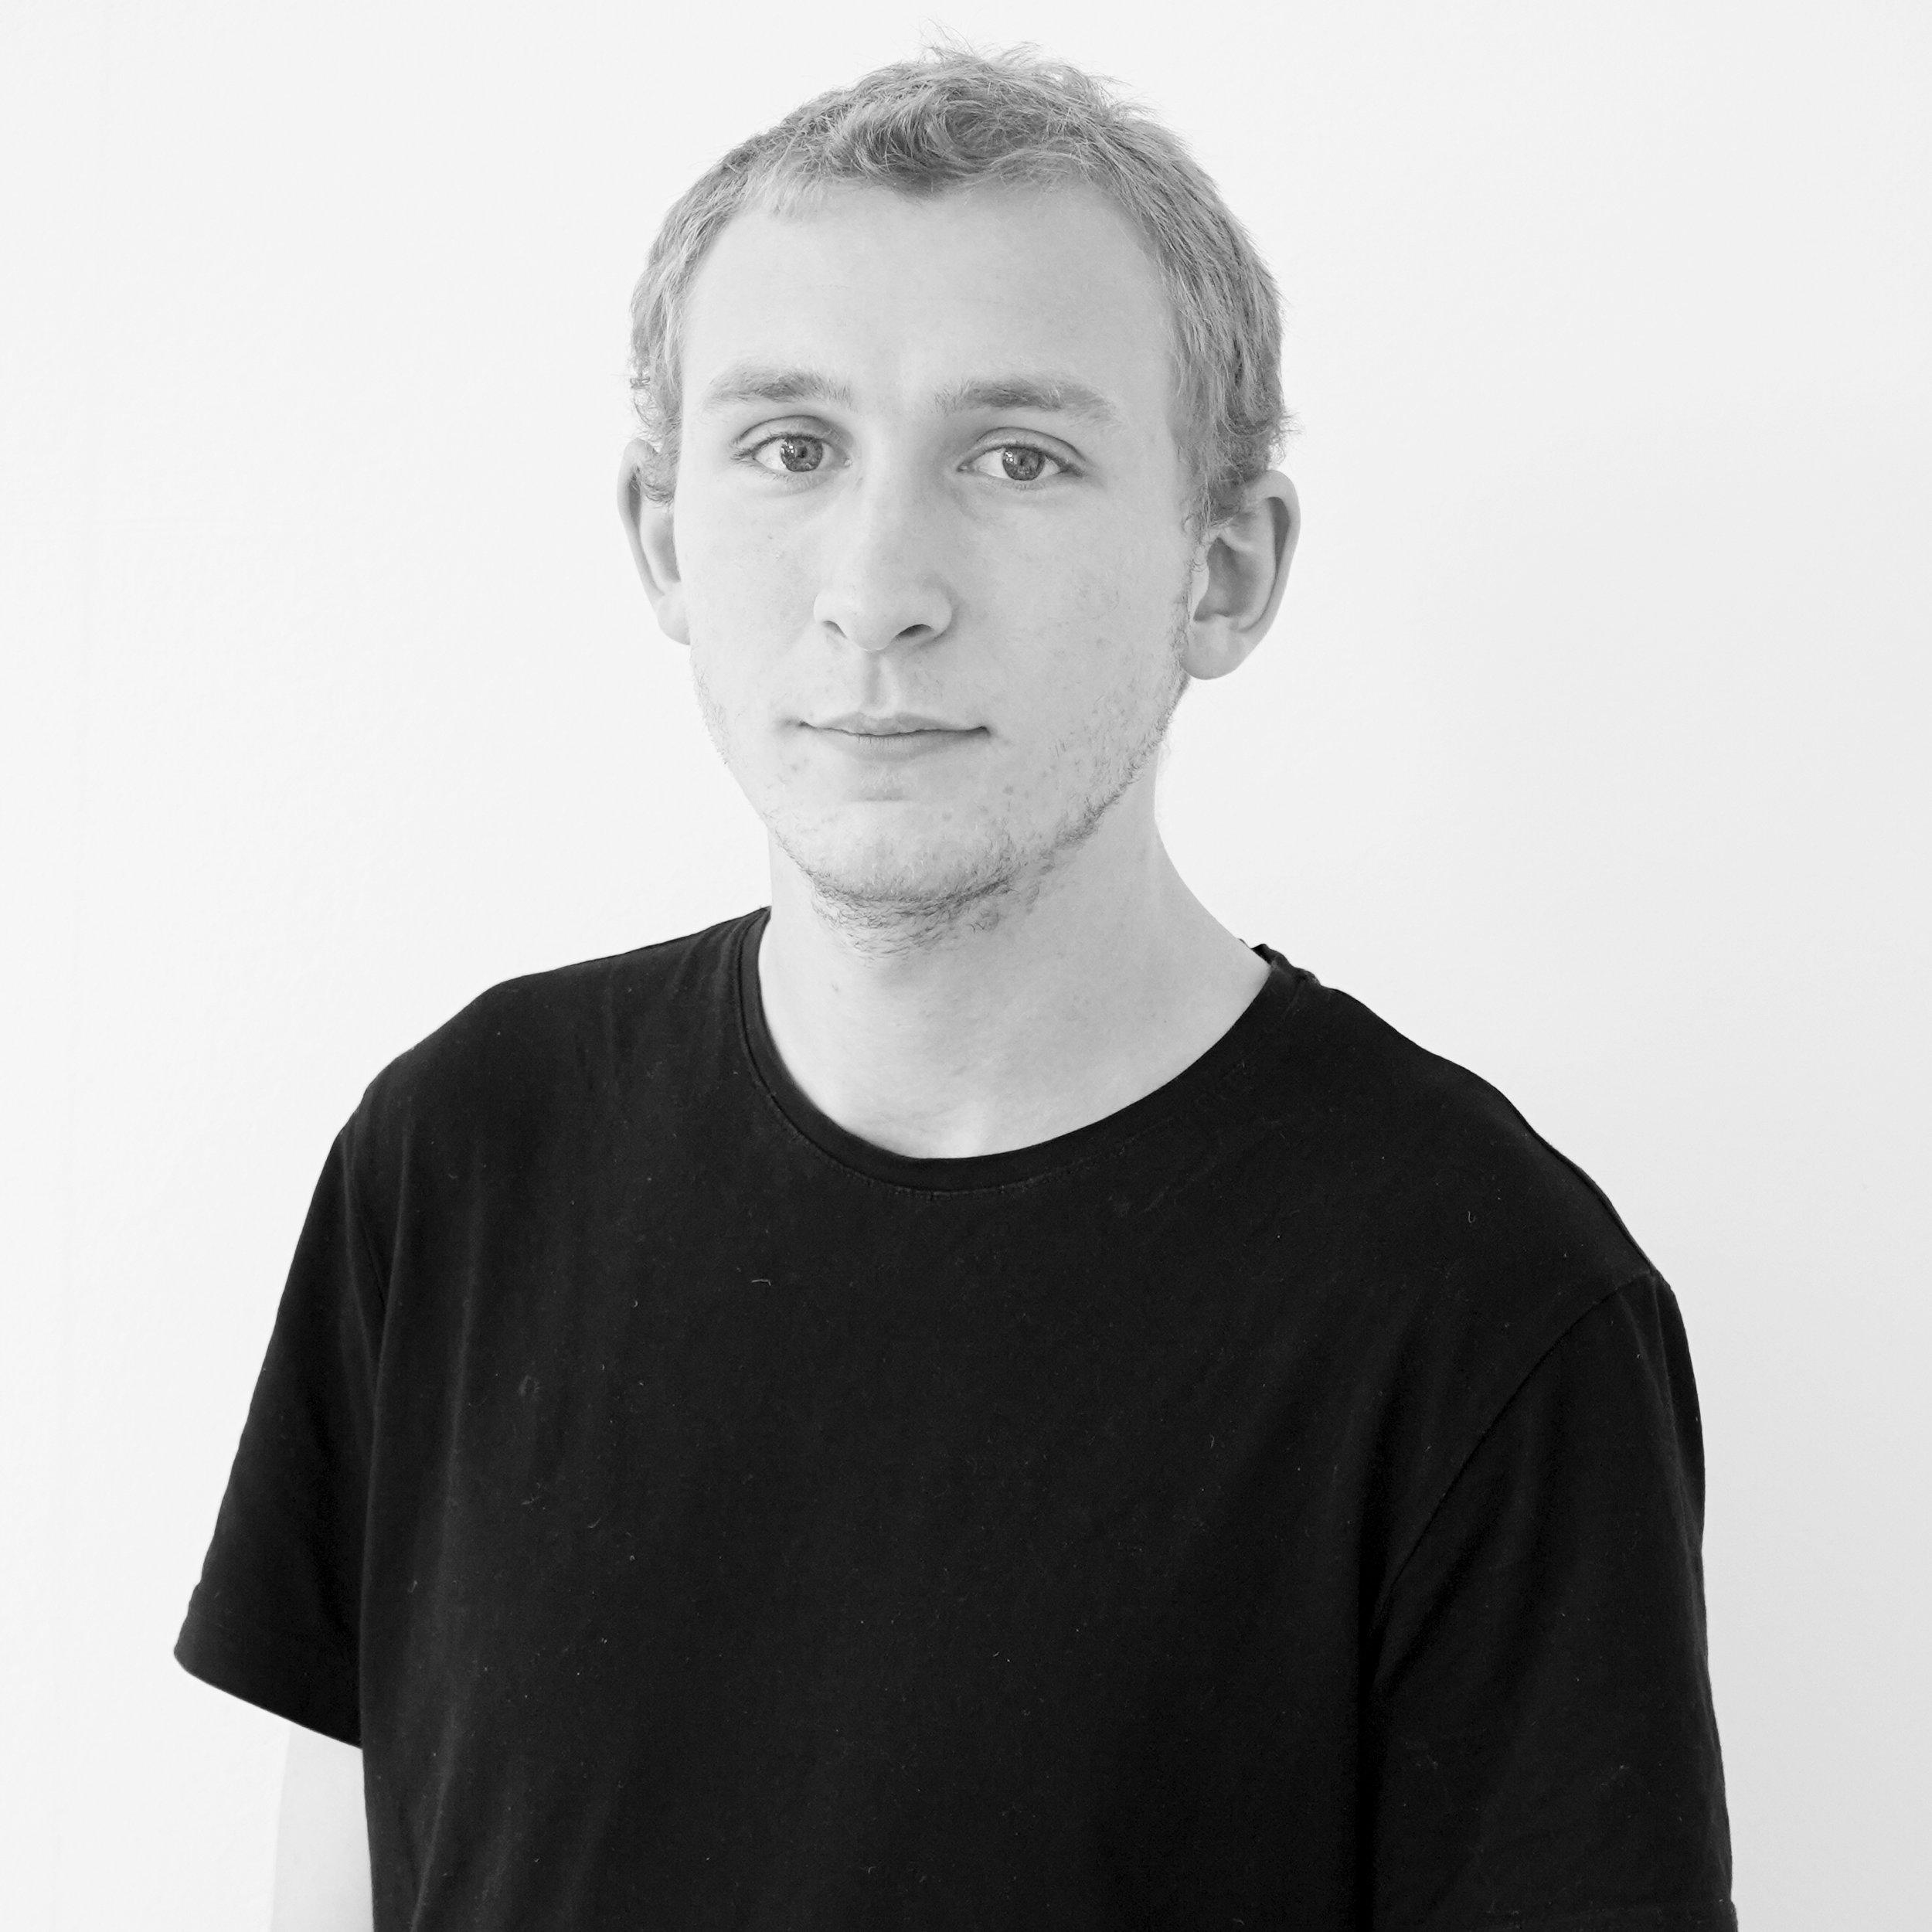 Simon Veitland